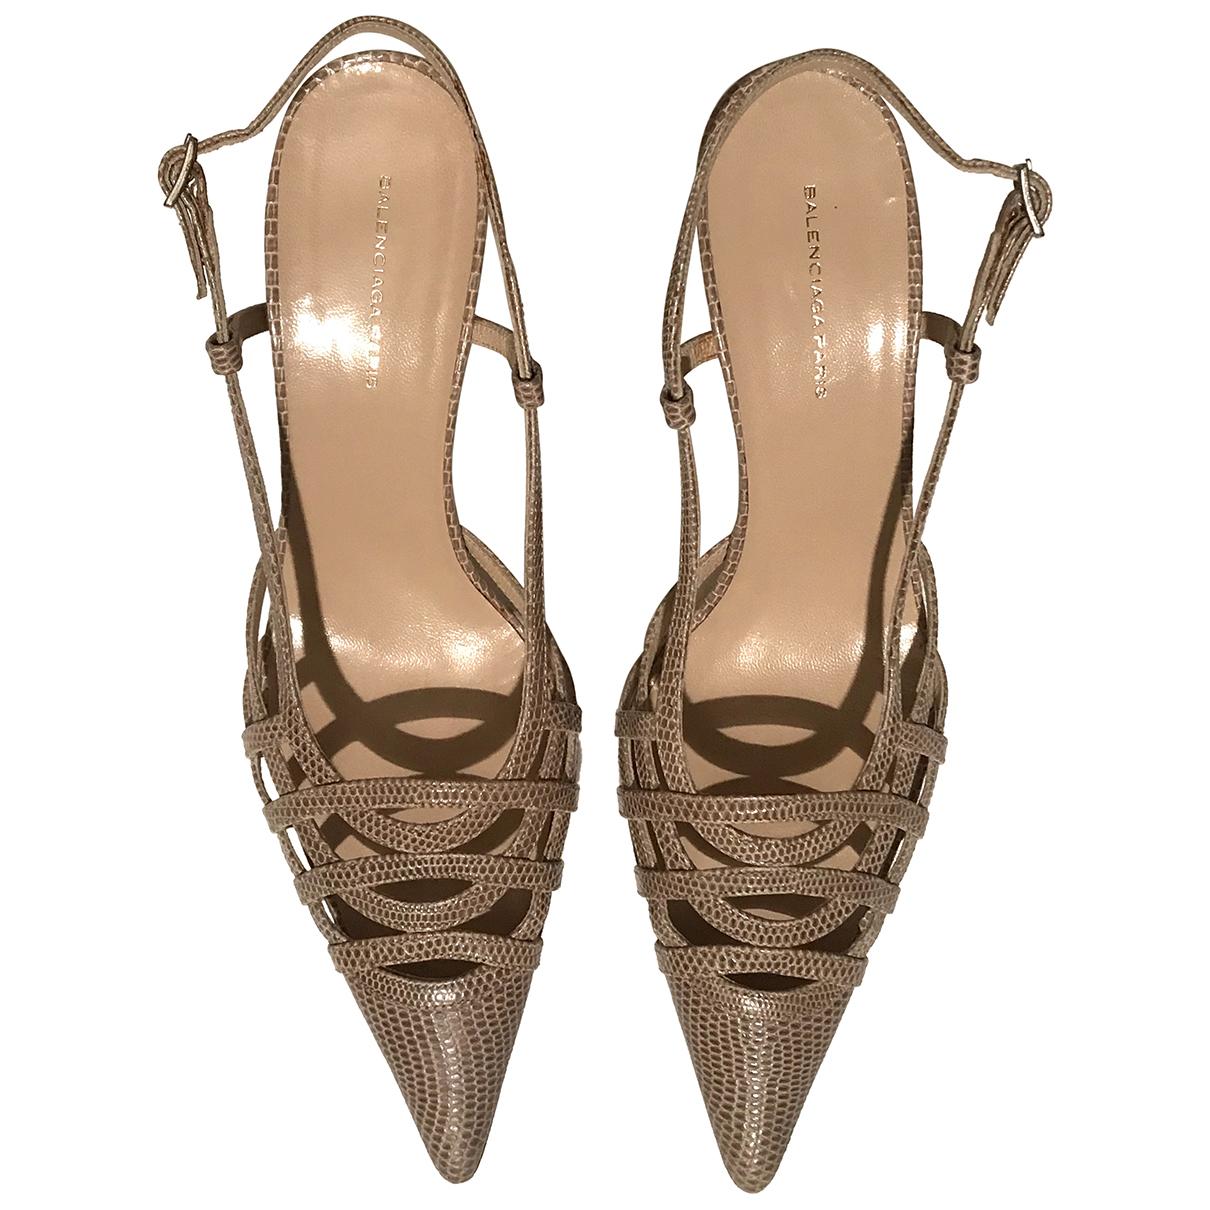 Balenciaga N Beige Leather Heels for Women 38 EU